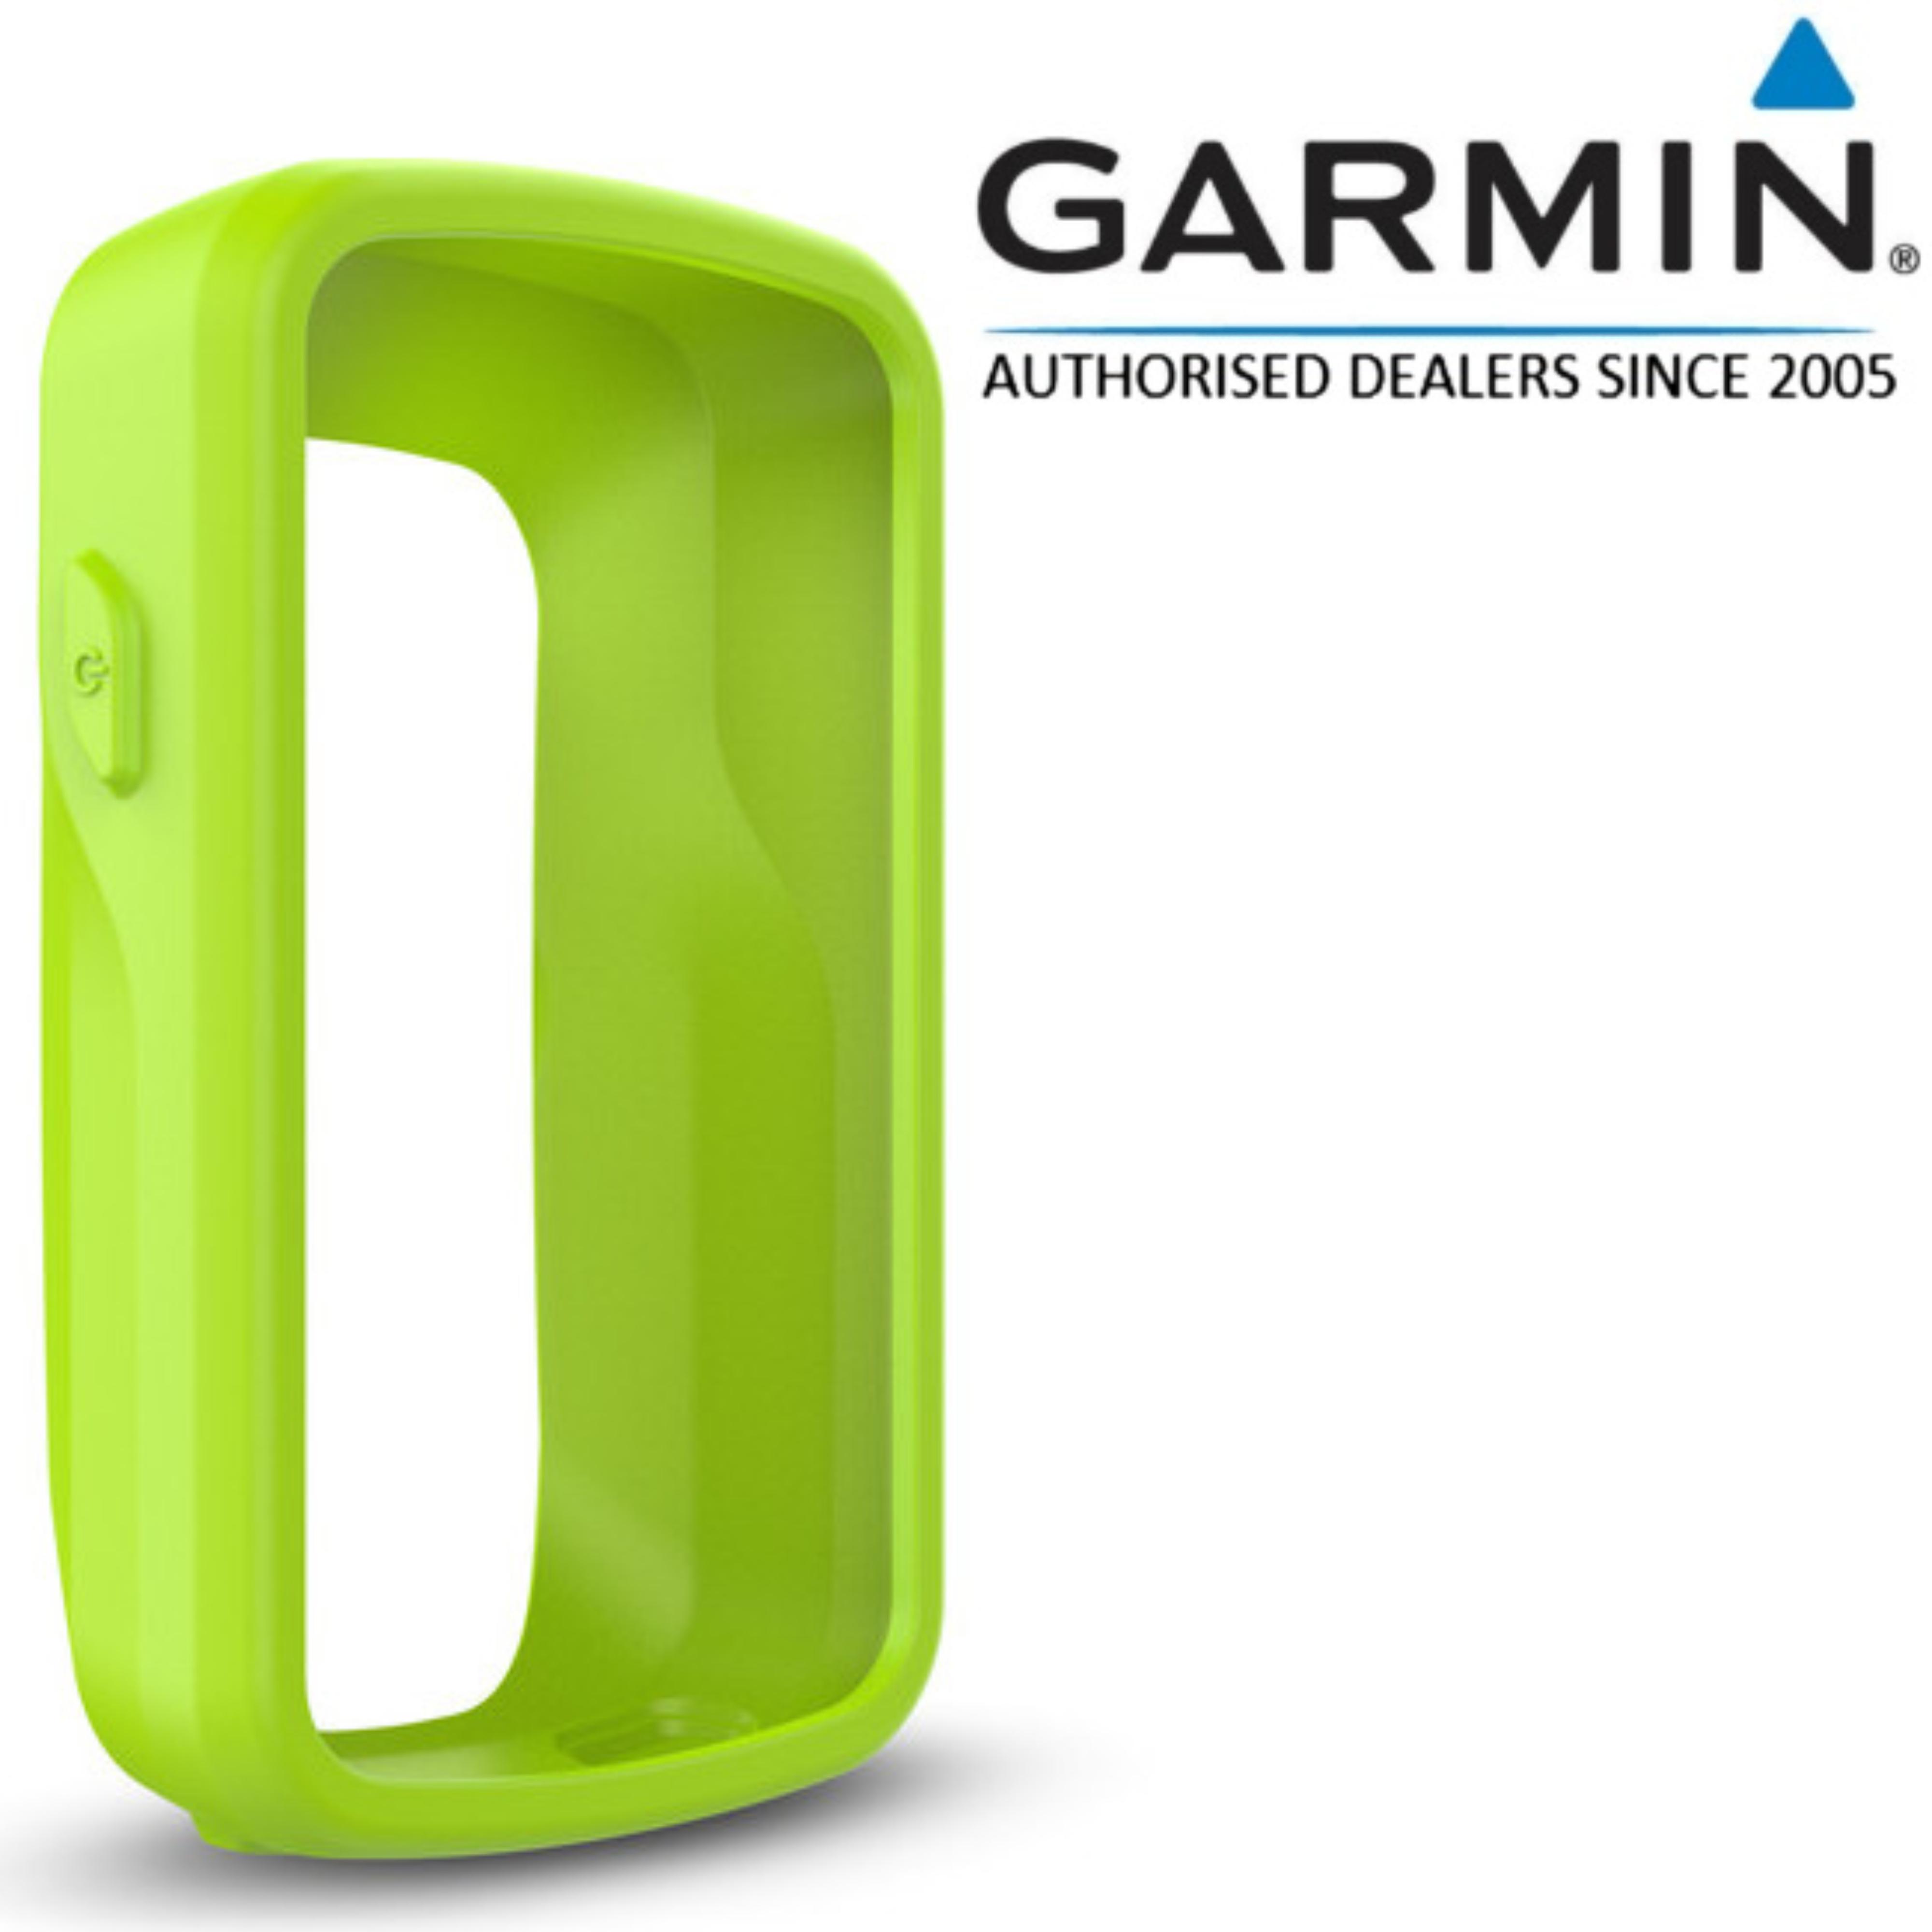 Garmin Silicone Case   Protective Cover   For Edge 820-Explore 820 GPS Bike Computer